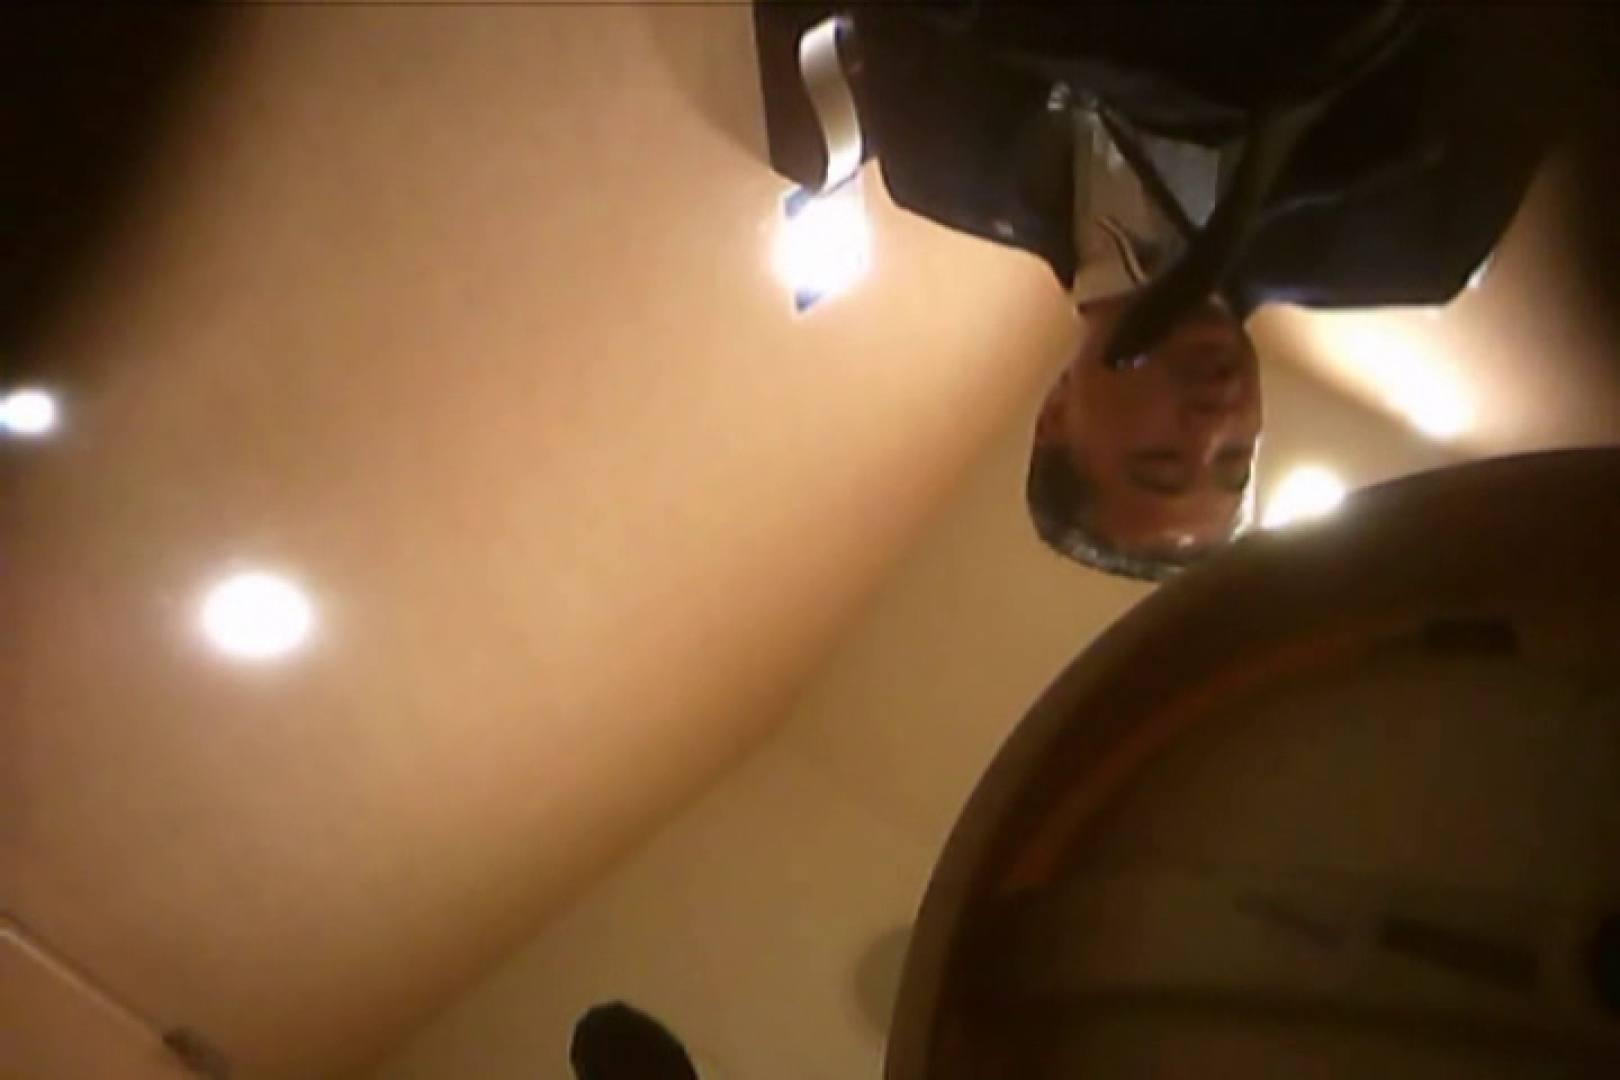 SEASON 2ND!掴み取りさんの洗面所覗き!in新幹線!VOL.16 イケメンのゲイ達 | ノンケ  102枚 43